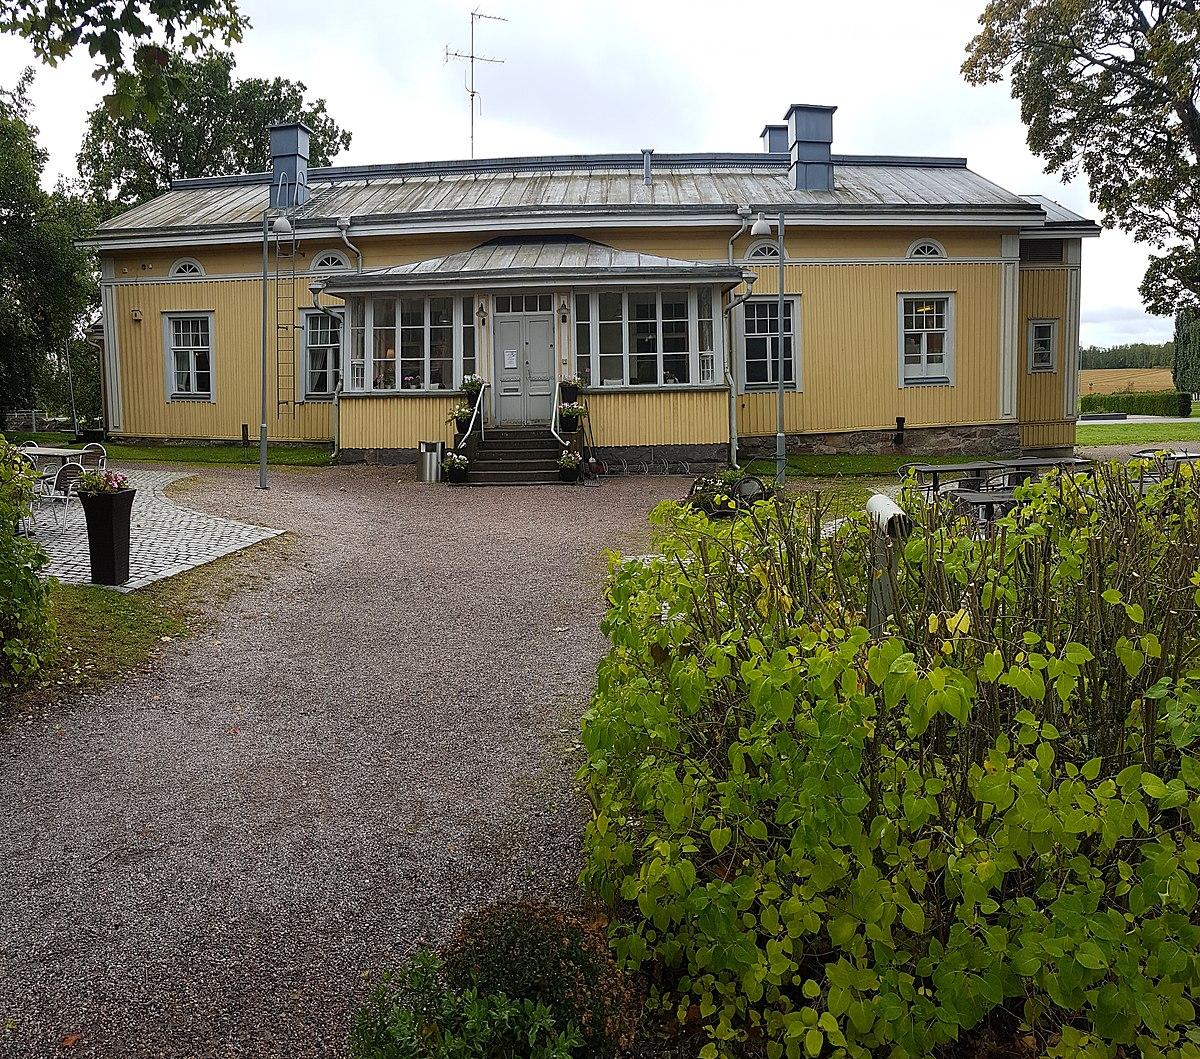 Lauantai Lounas Turku